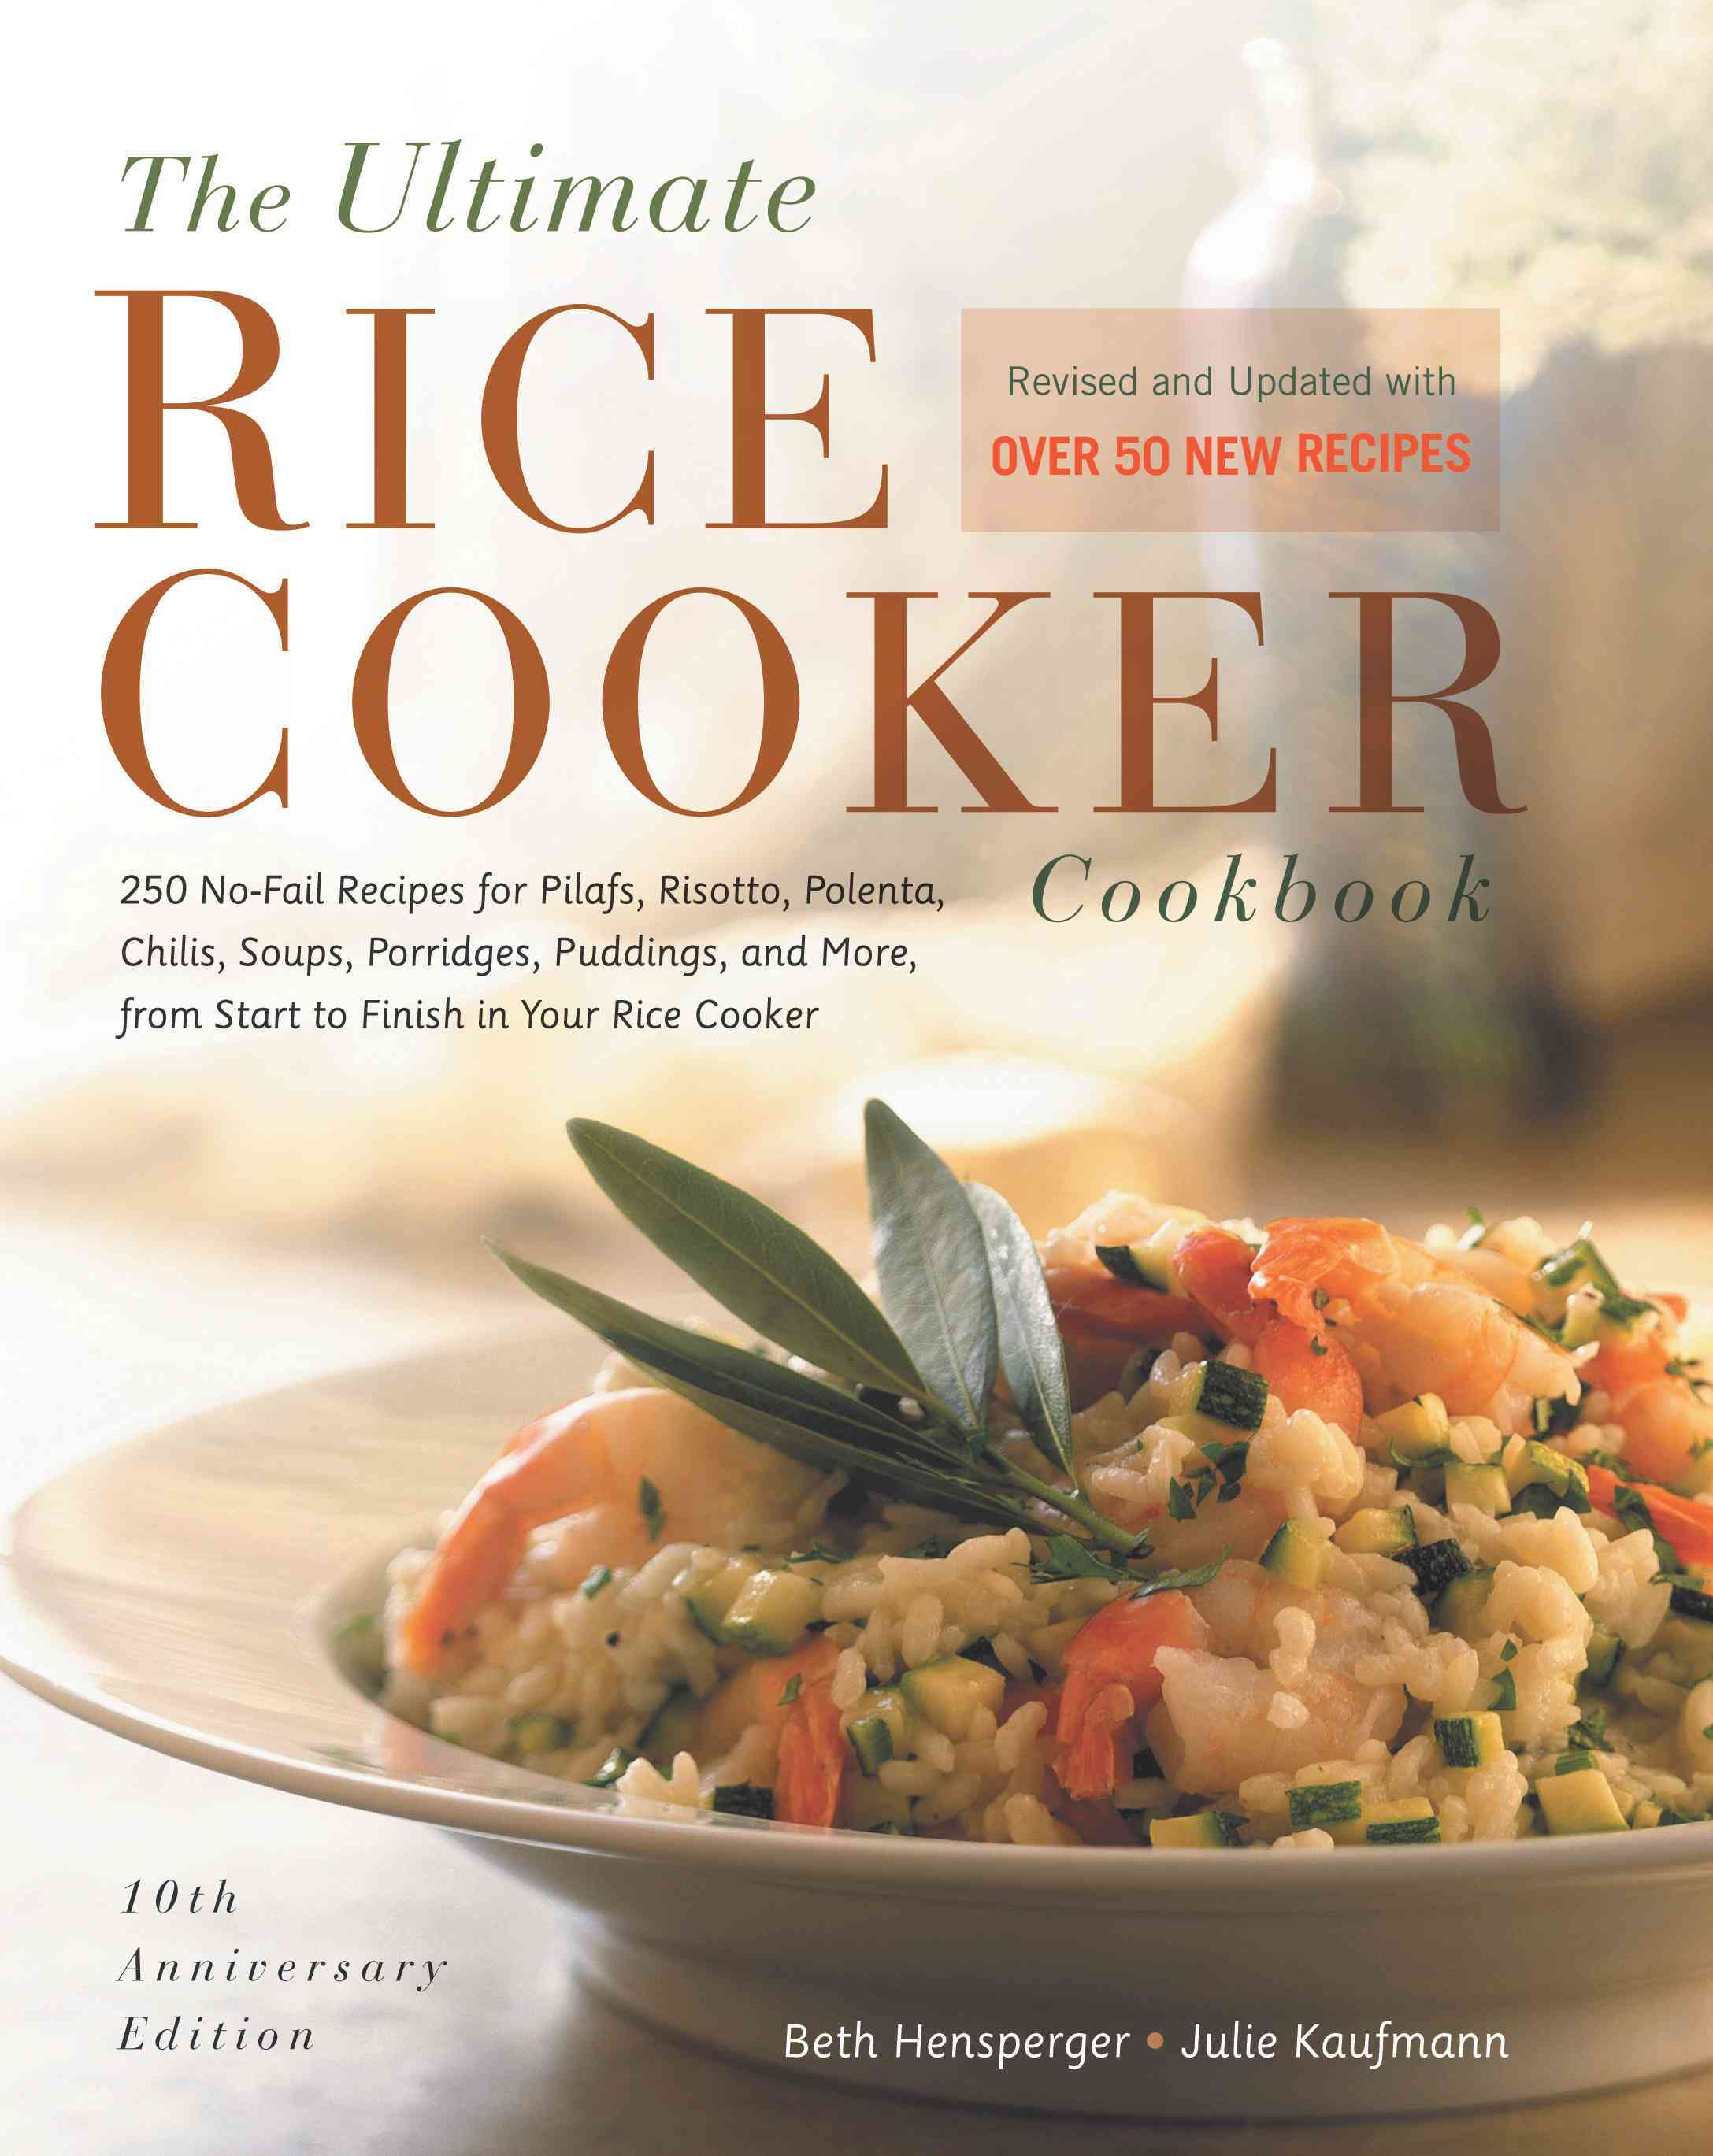 The Ultimate Rice Cooker Cookbook: 250 No-Fail Recipes for Pilafs, Risottos, Polenta, Chilis, Soups, Porridges, P... (Paperback)